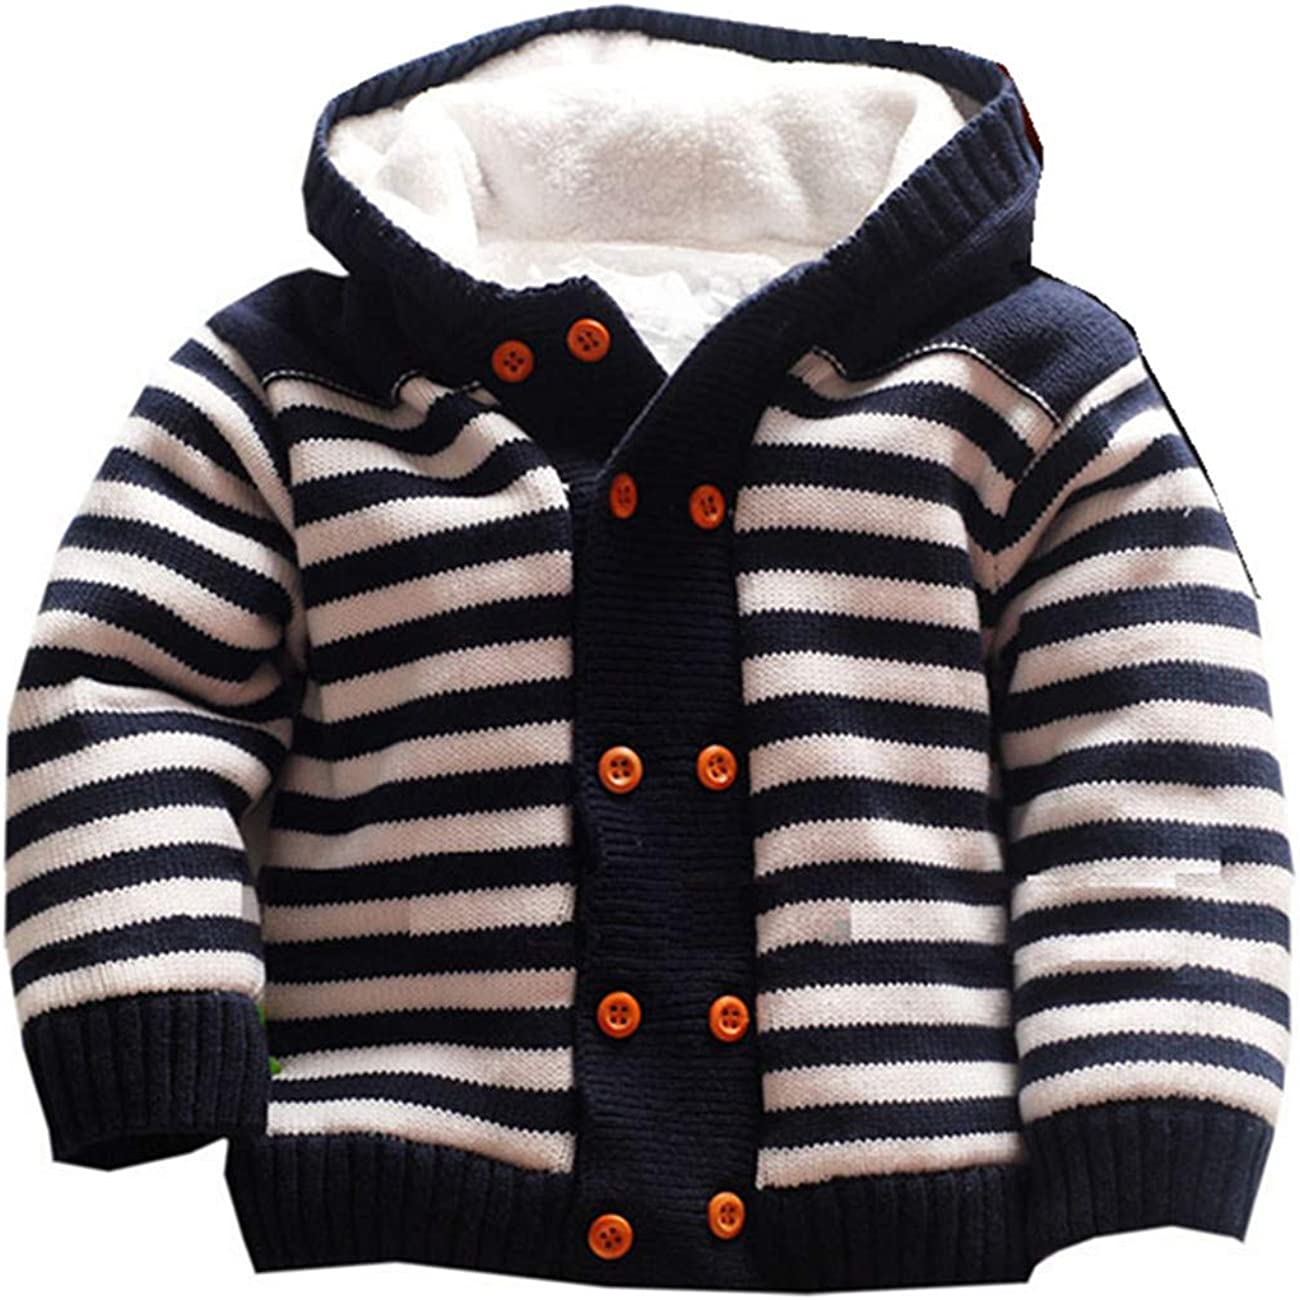 0-3 M Baby Boys Warm Fleece Lined Knitted Jacket Winter Design Blue  RRP £9.00